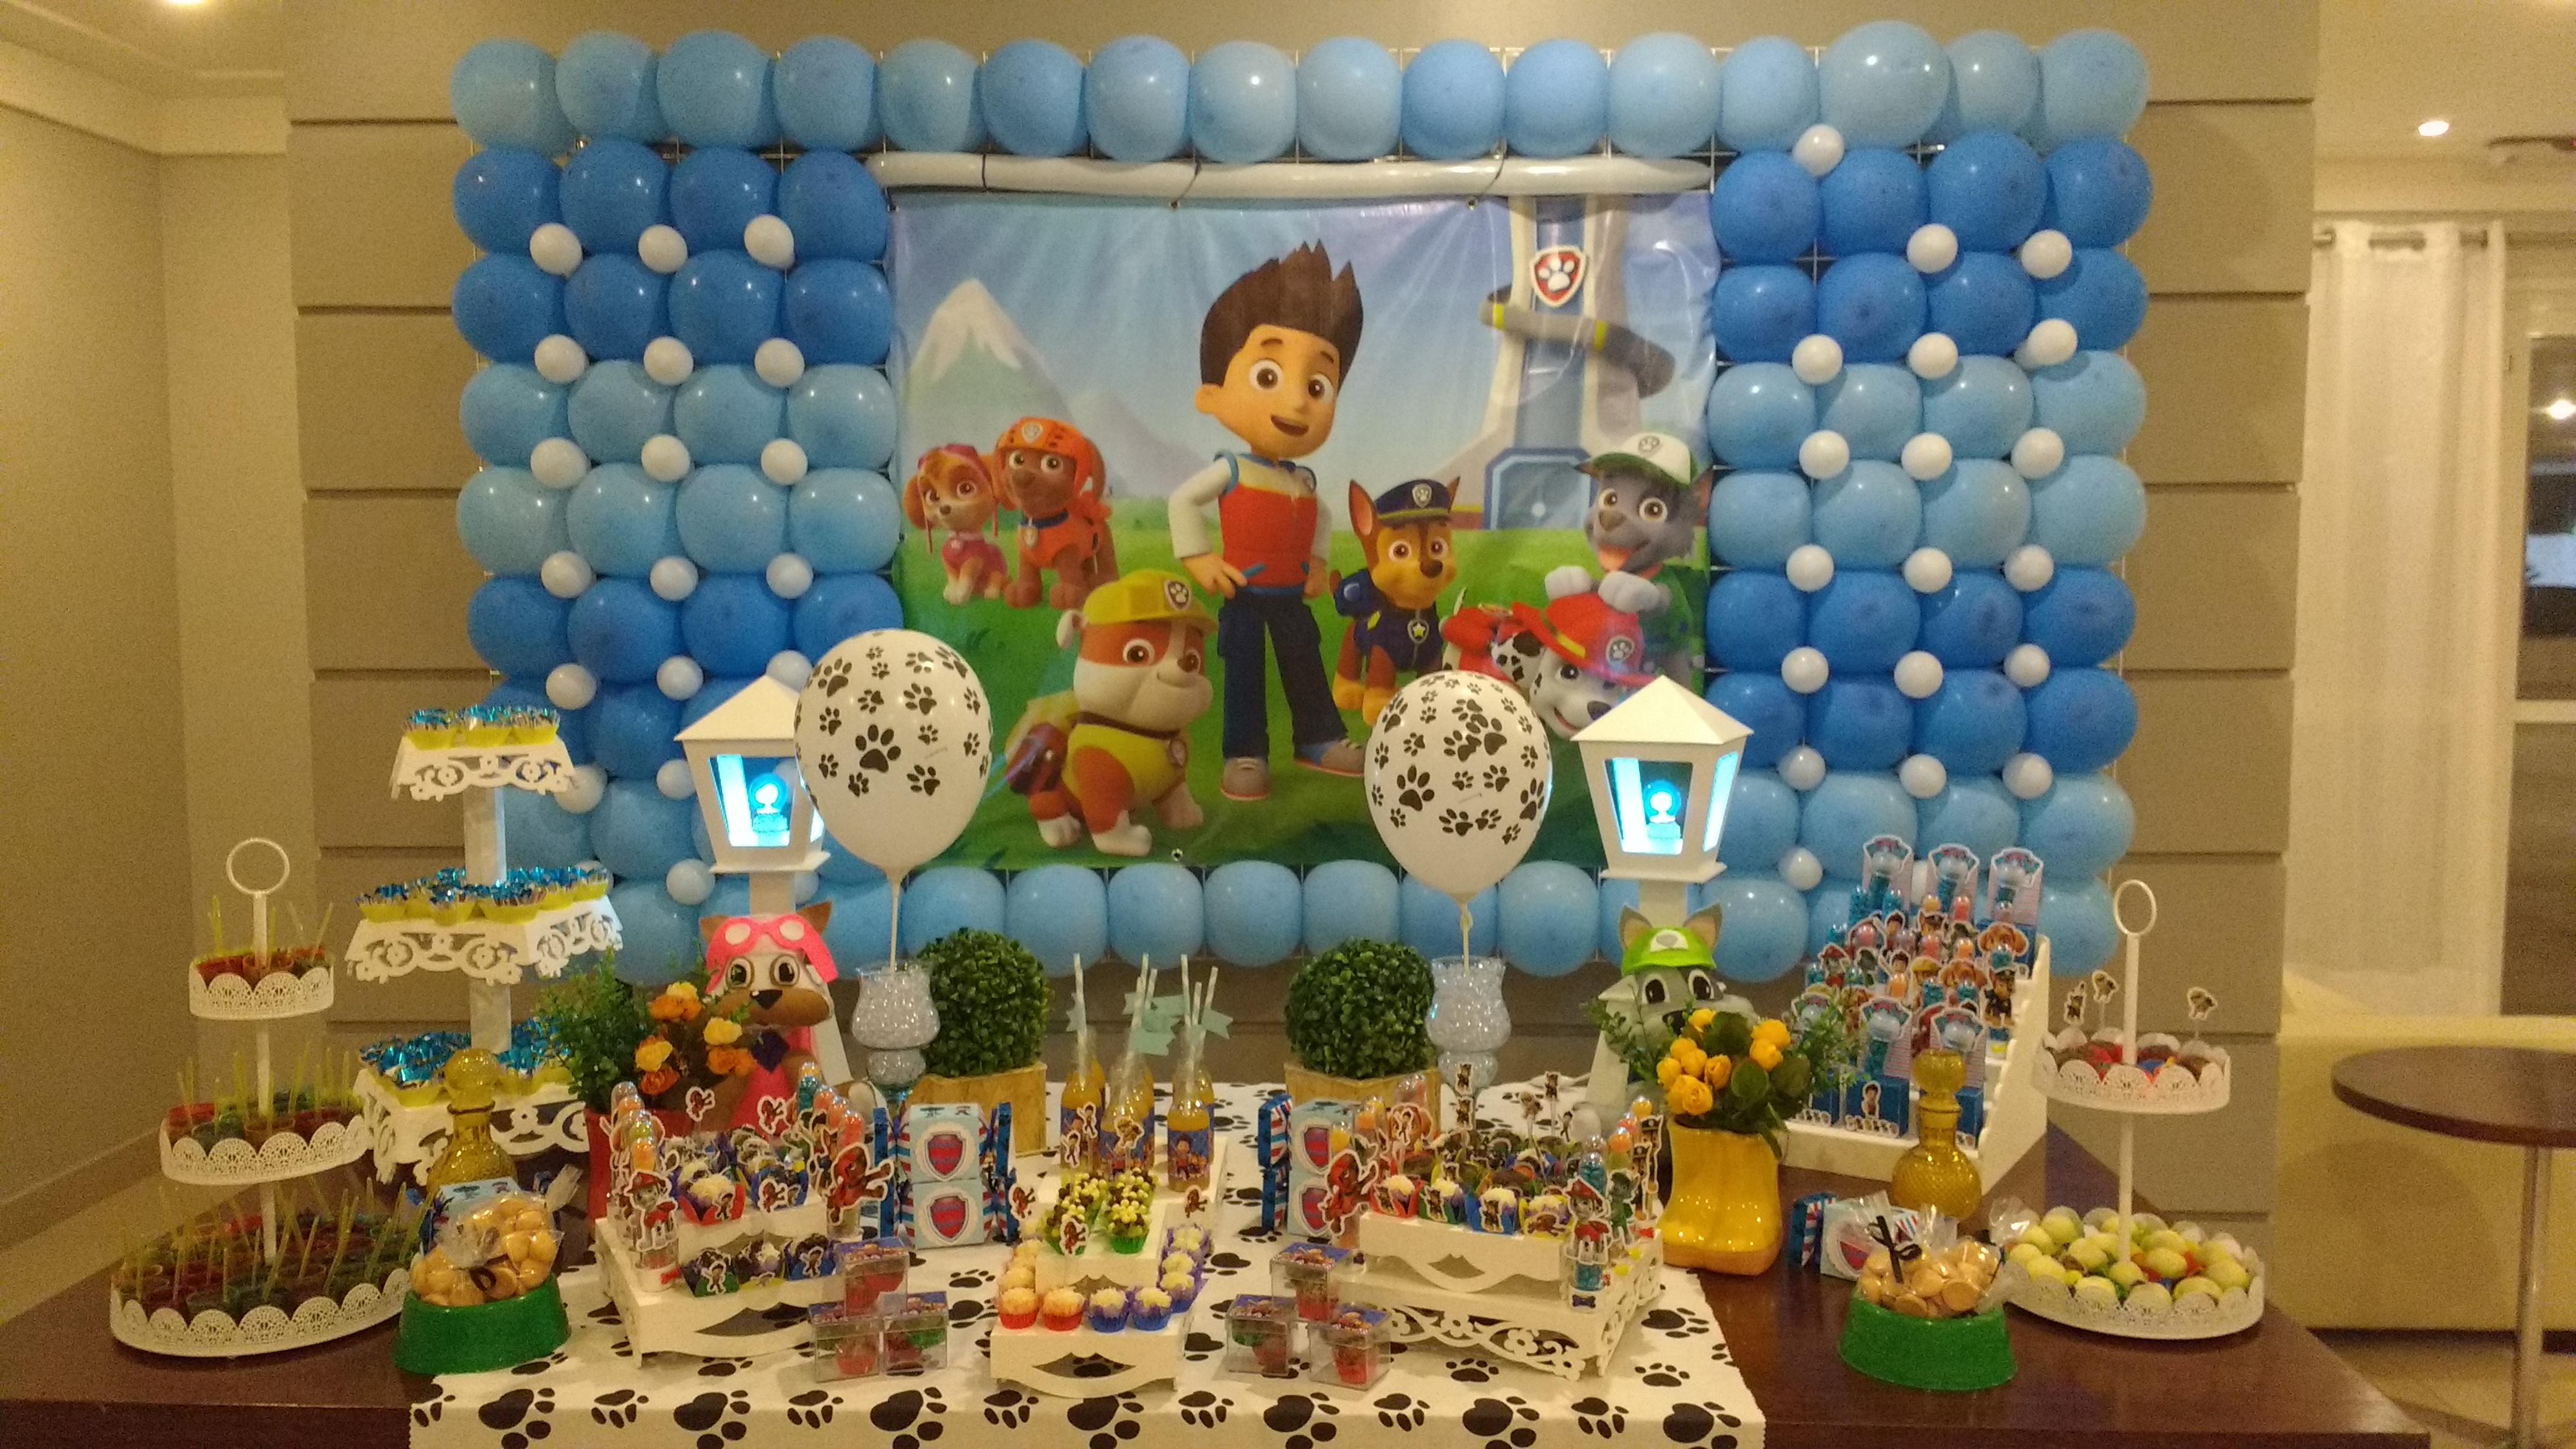 Festa Infantil - Patrulha Canina | Andréa e Artes | Elo7